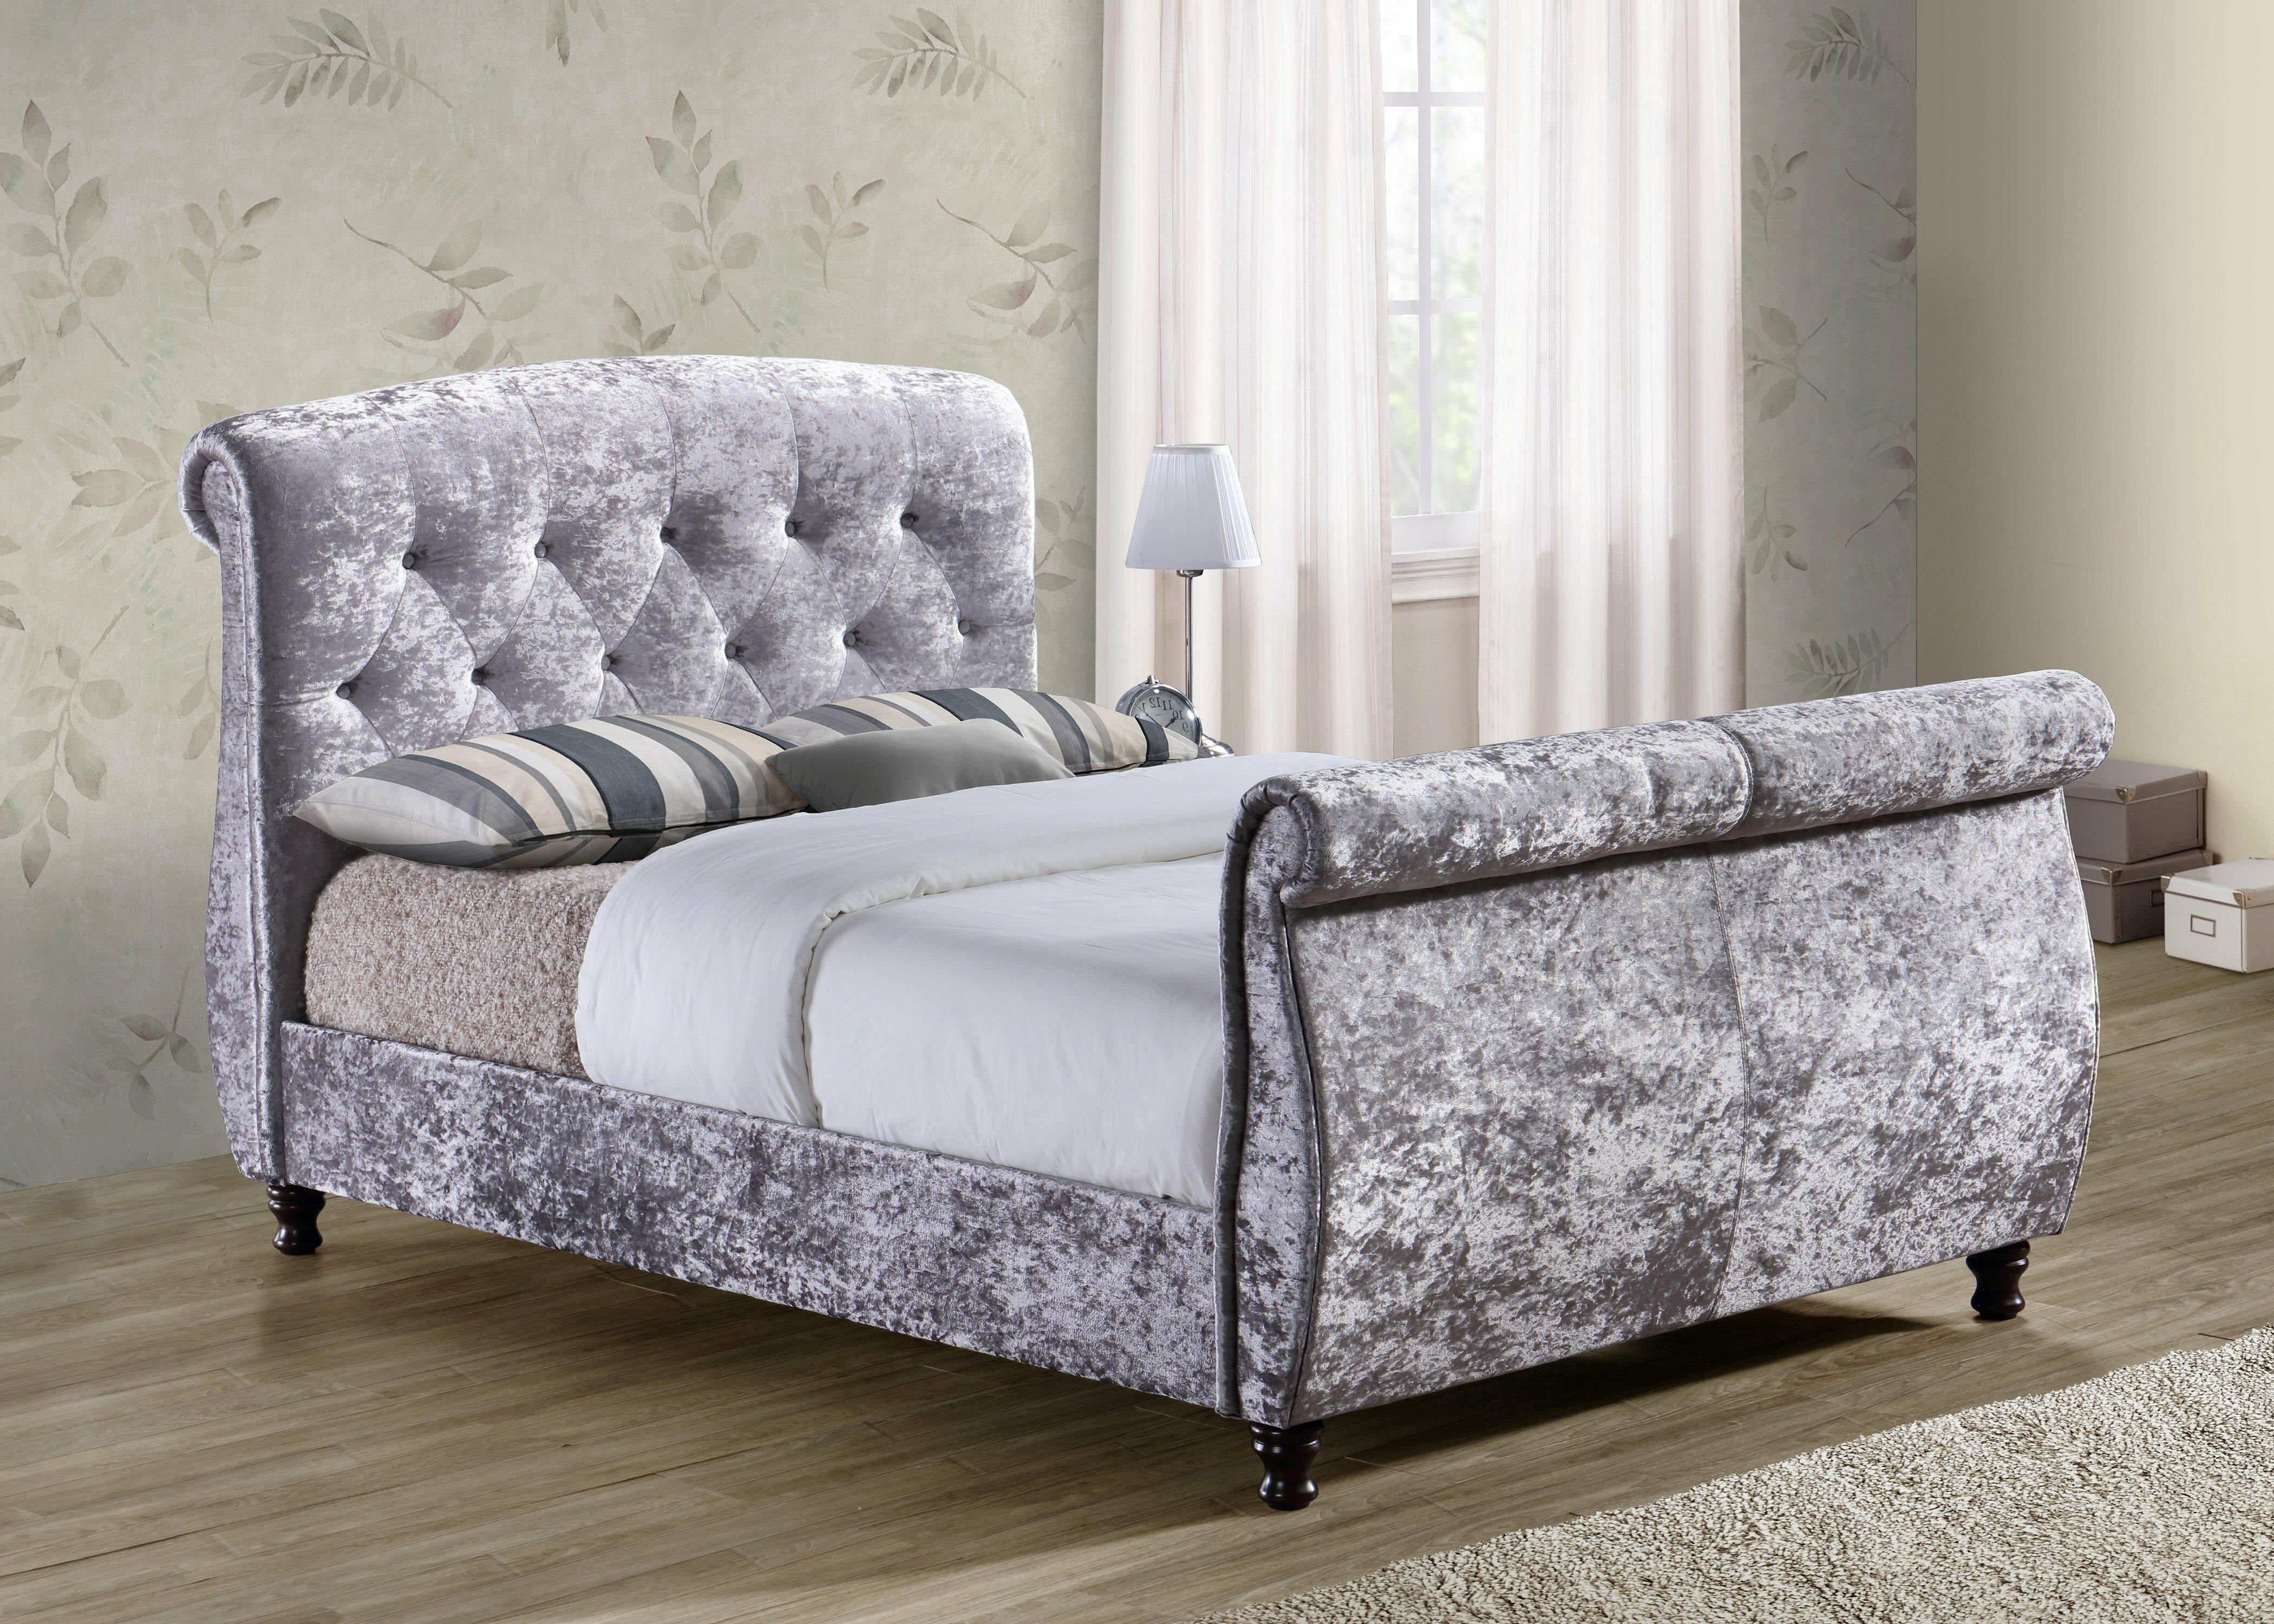 astoria sleigh upholstered grand murillo pdx bed transitional wayfair furniture